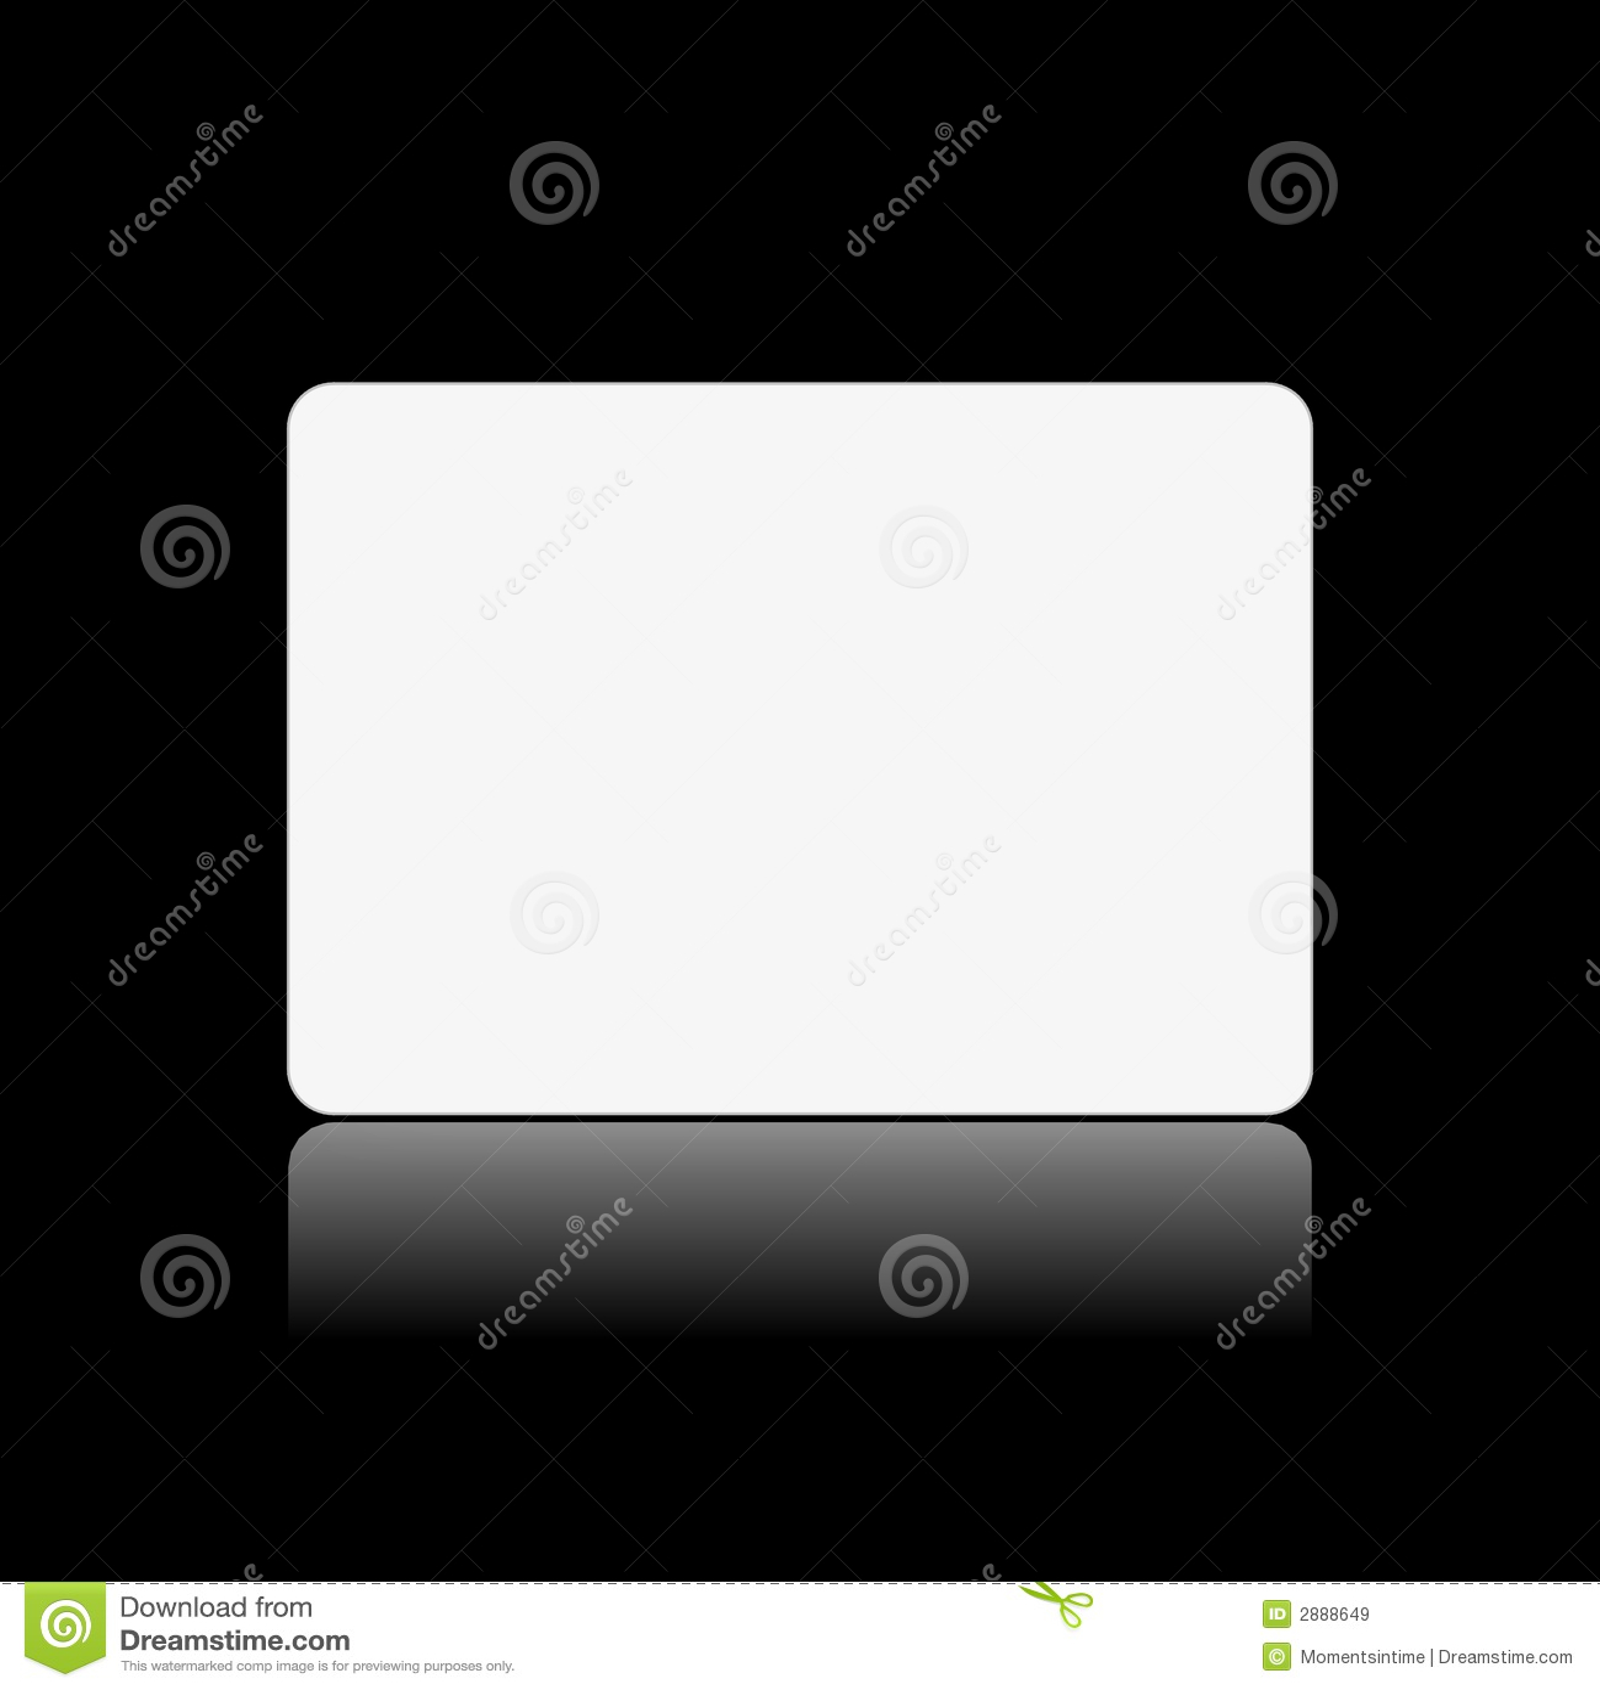 Blank white card on black